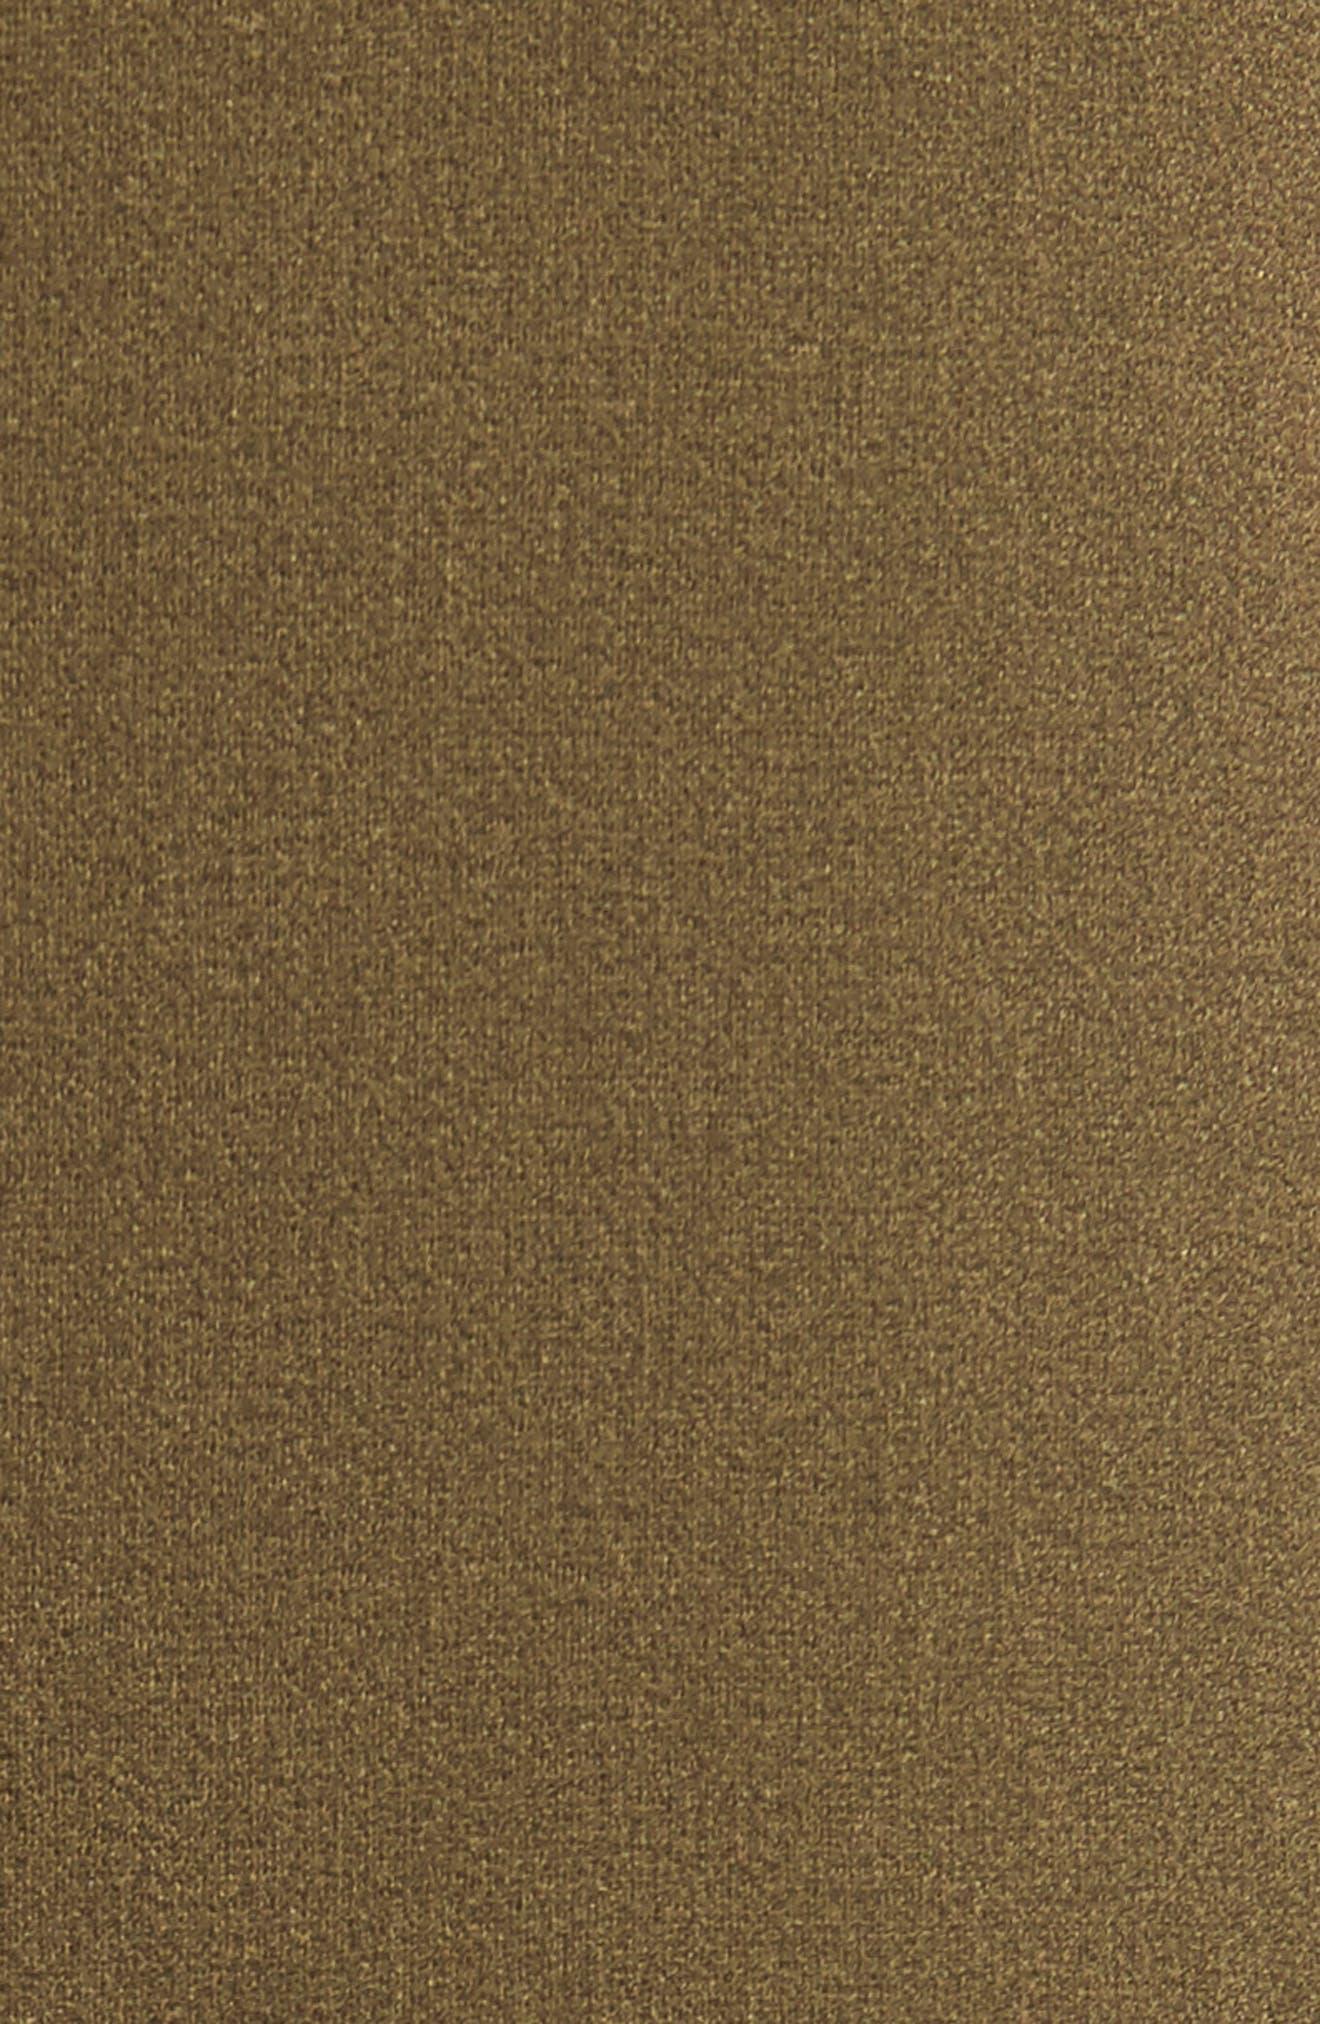 Hailey Crepe Dress,                             Alternate thumbnail 5, color,                             Olive